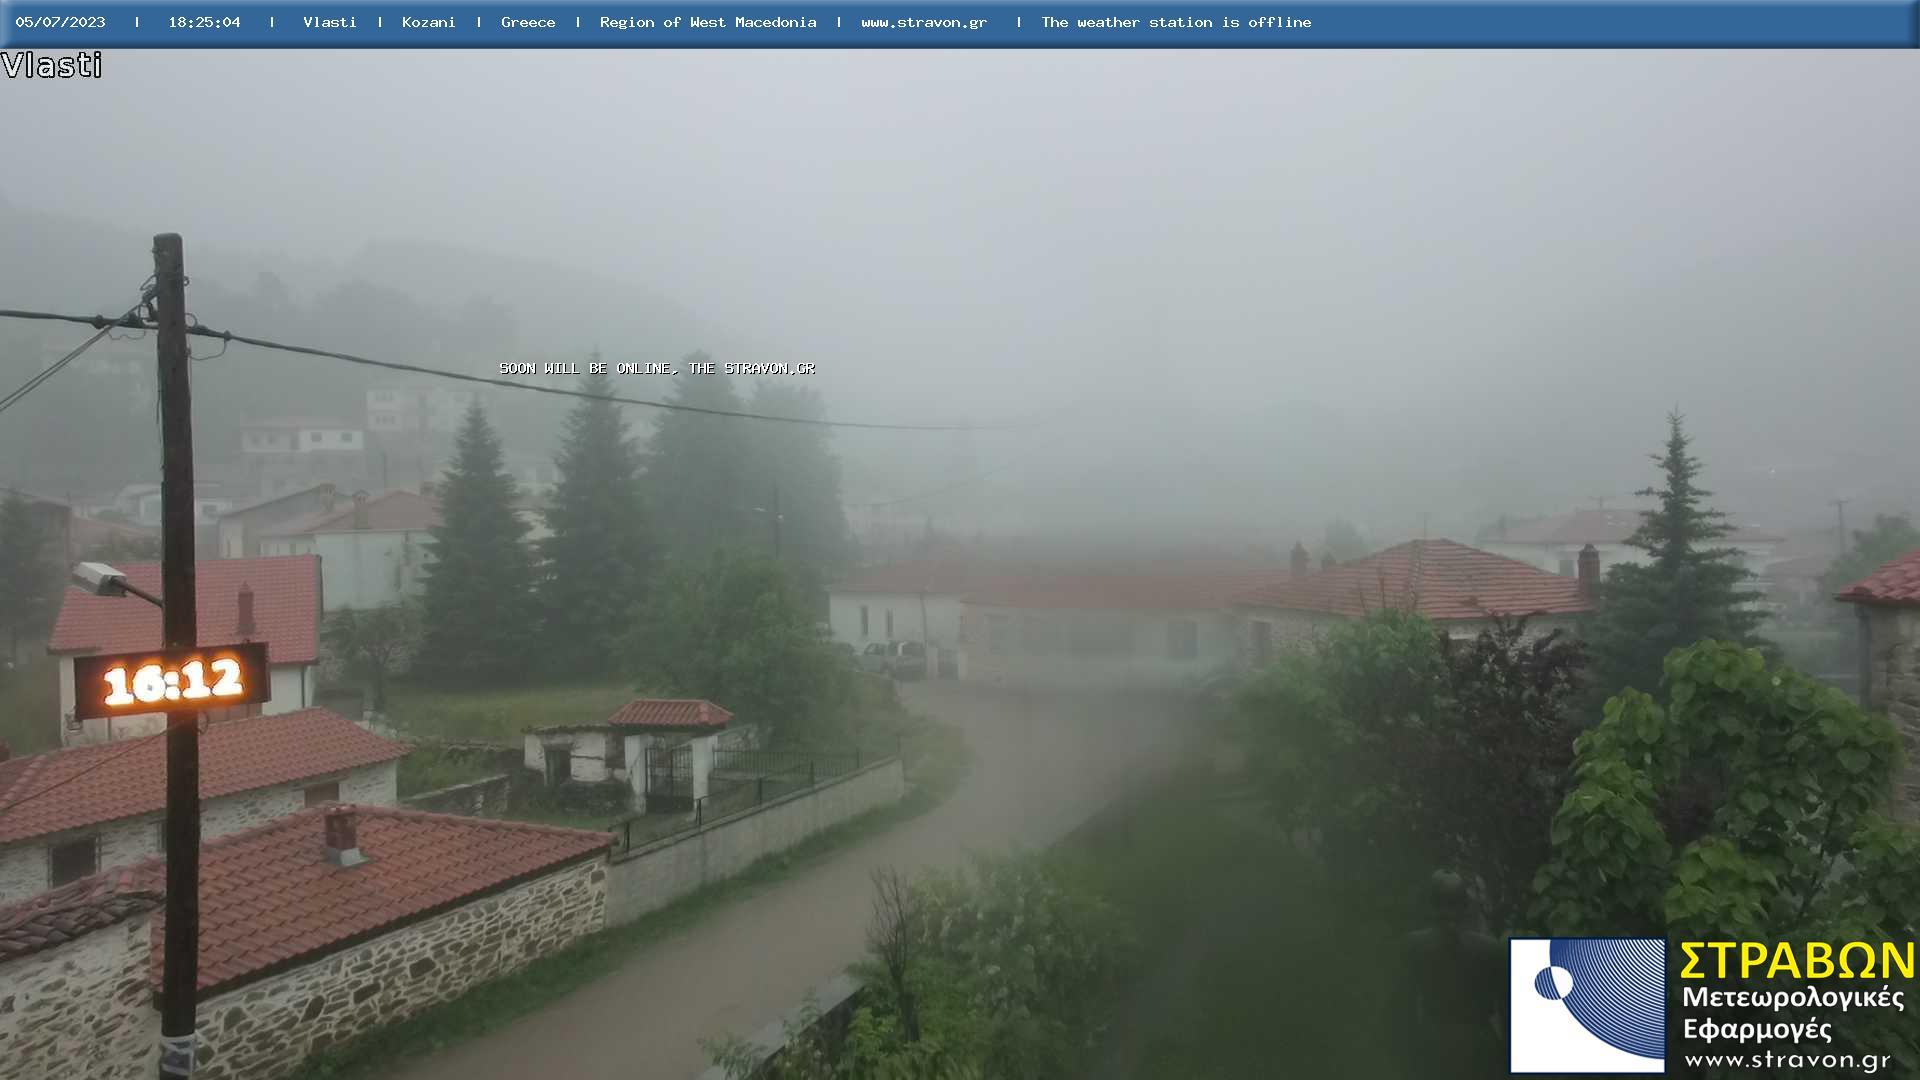 http://www.stravon.gr/meteocams/vlasti/